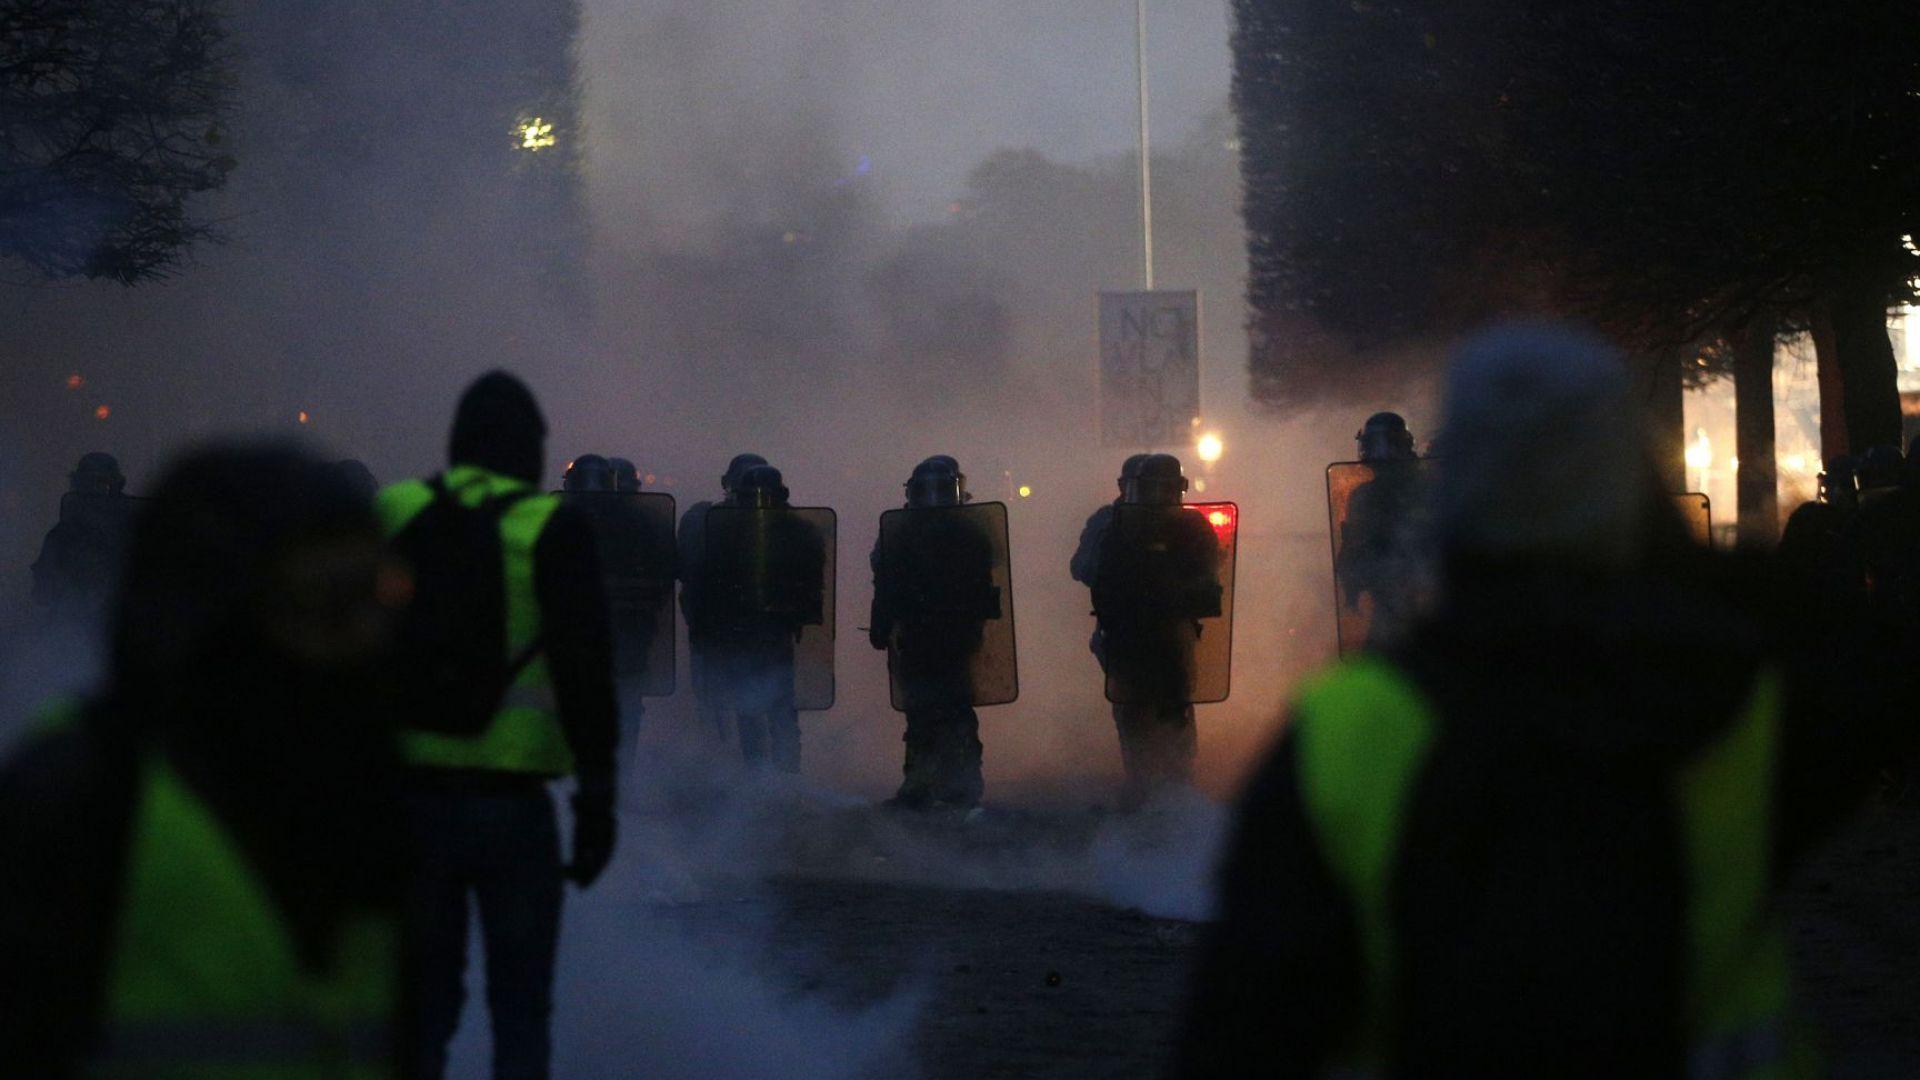 Сграда близо до Триумфалната арка бе подпалена по време на протестите